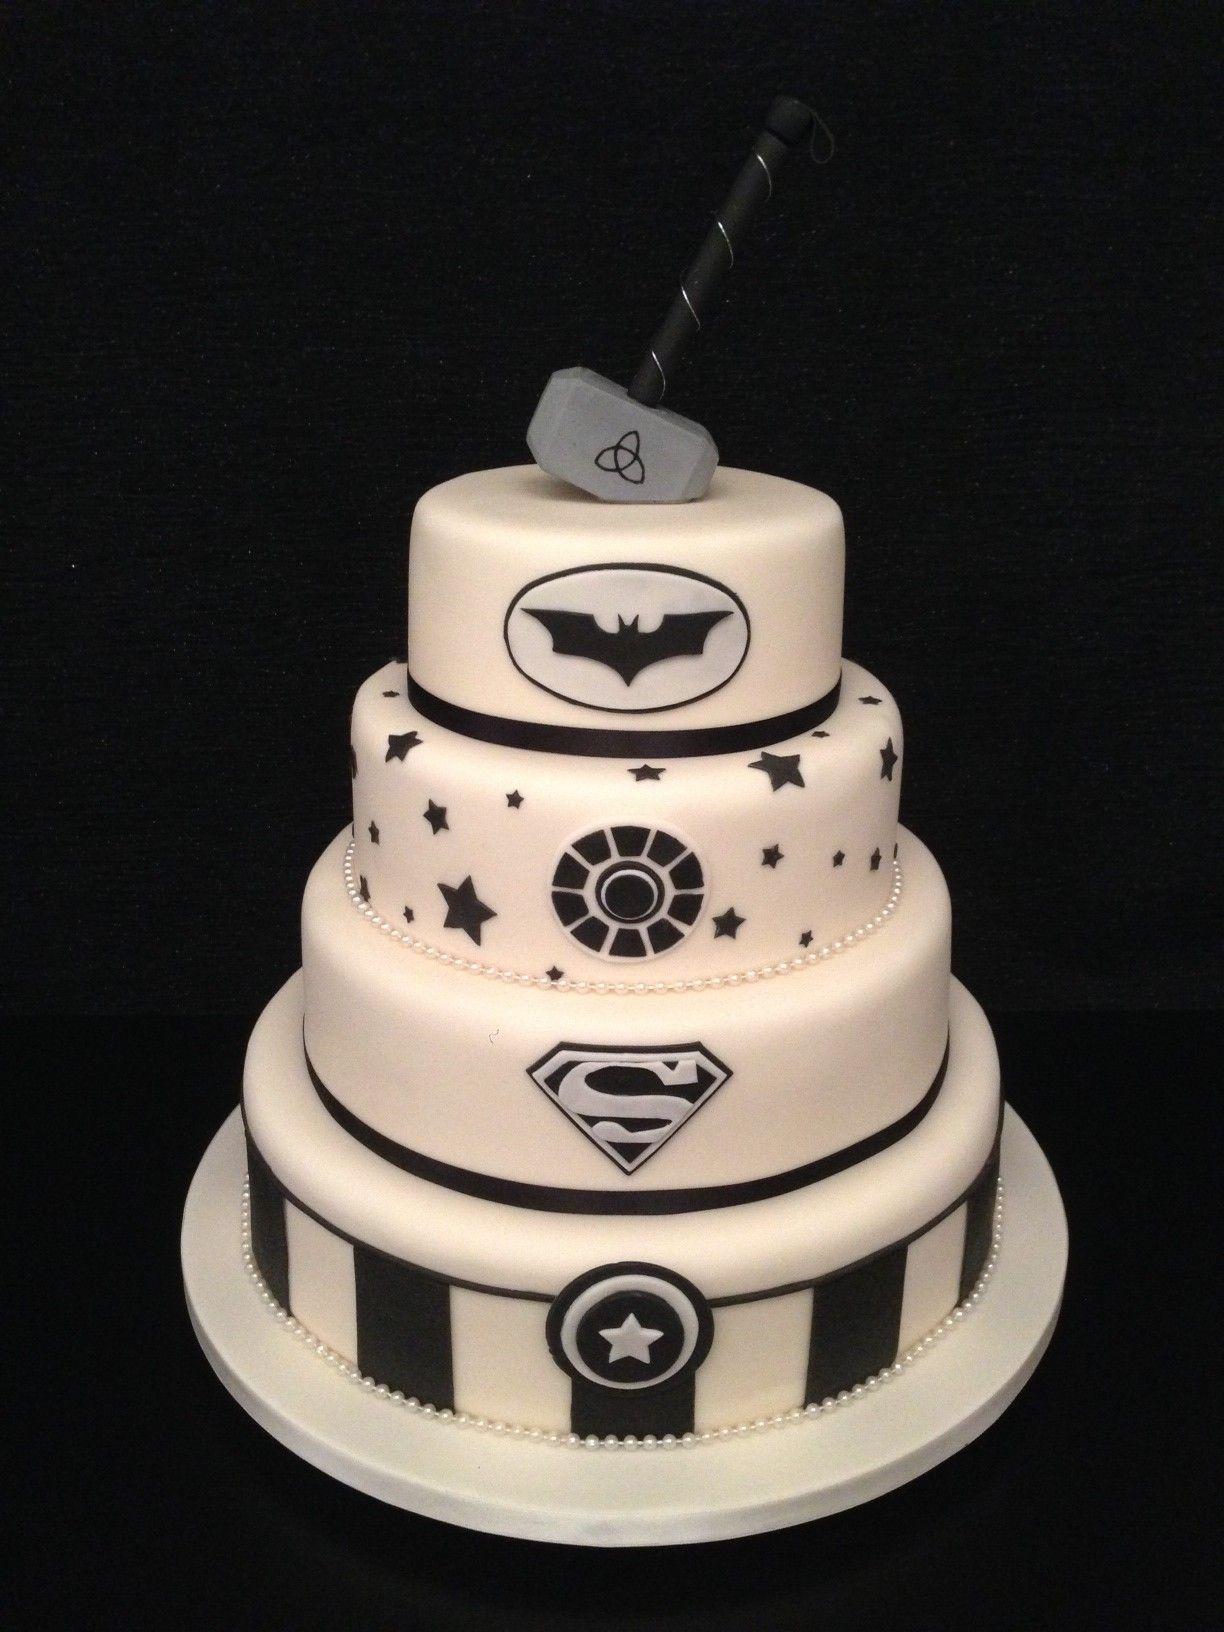 Superhero Wedding Cakes Google Search My Big Fat Geek